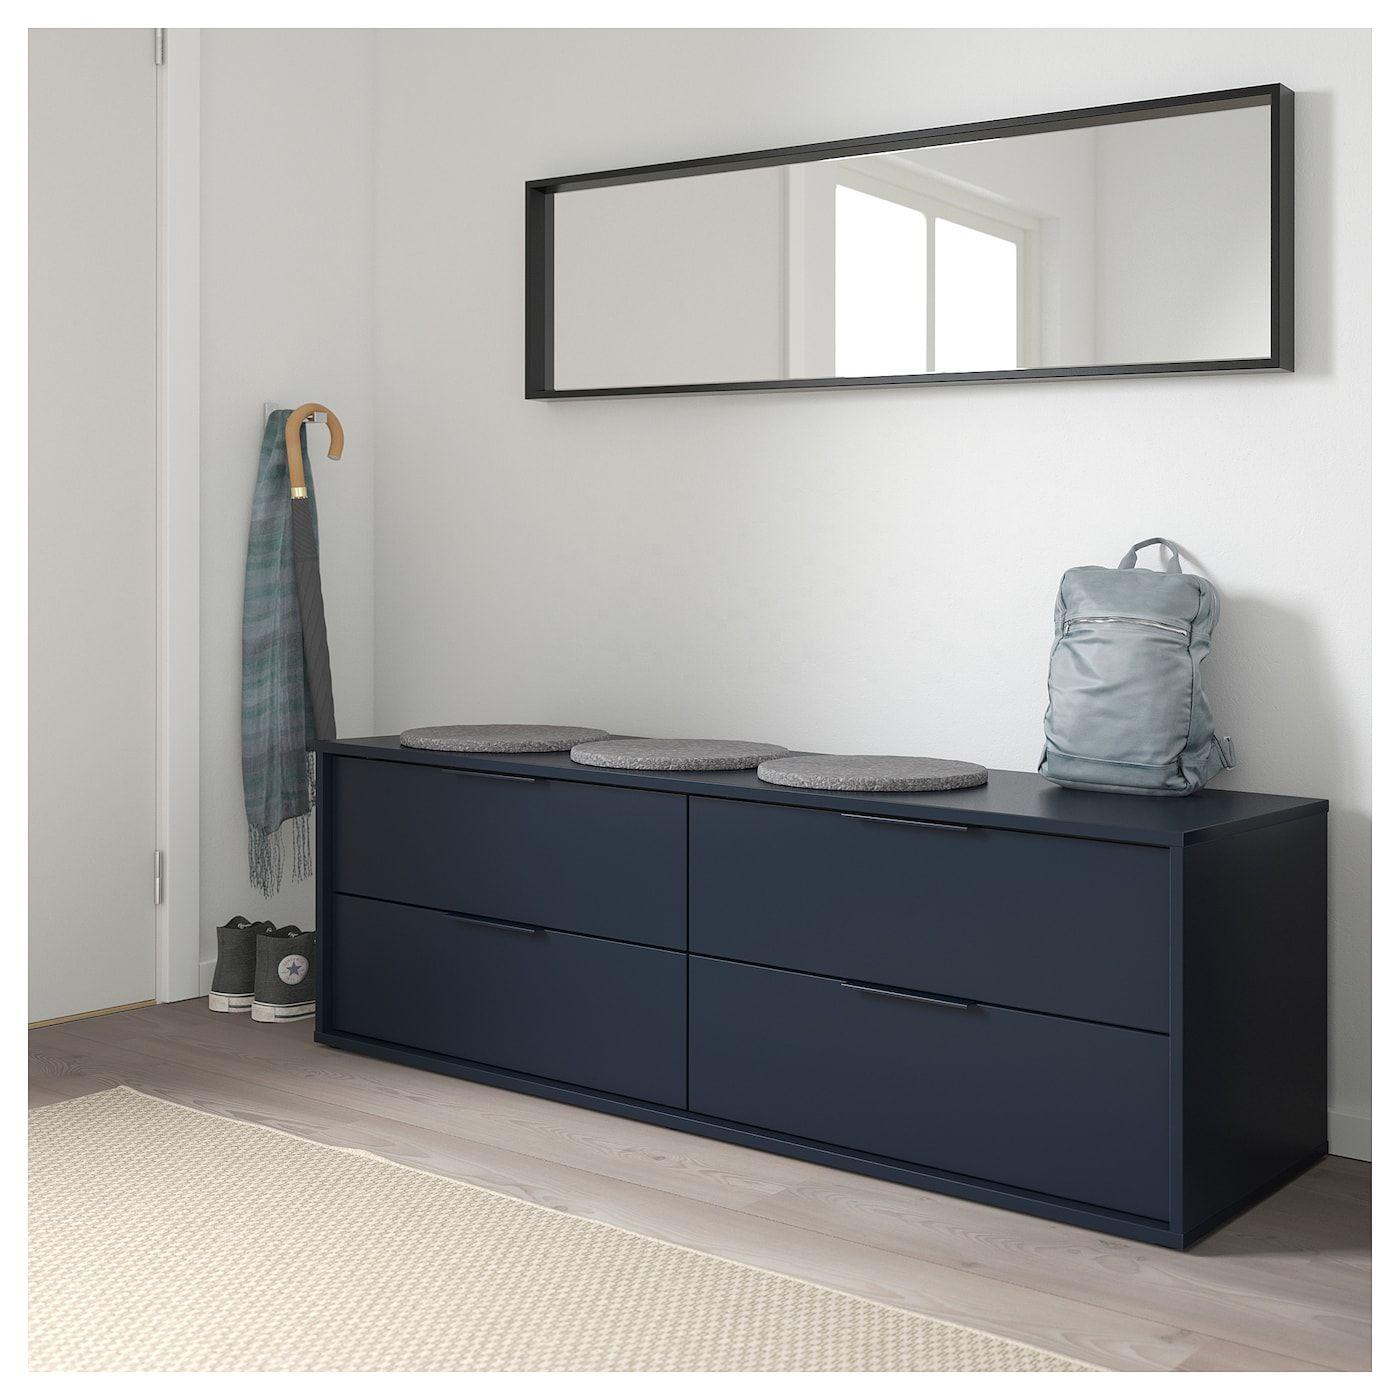 Nordmela 4 Drawer Dresser Black Blue 62 5 8x19 5 8 Wohnung